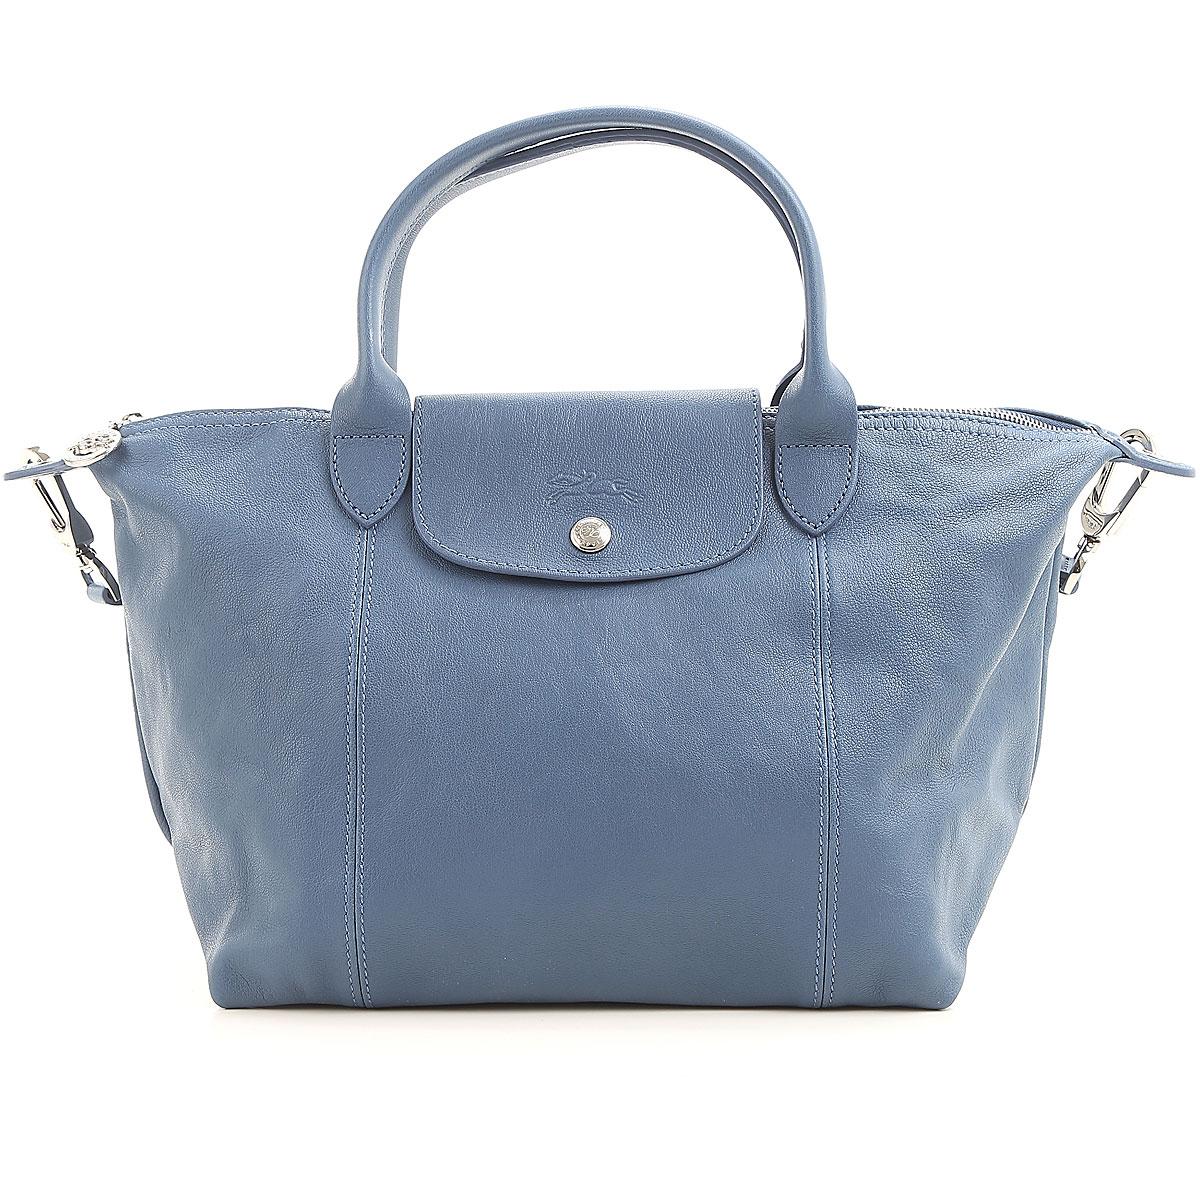 Image of Longchamp Top Handle Handbag On Sale, Denim Blu, Leather, 2017